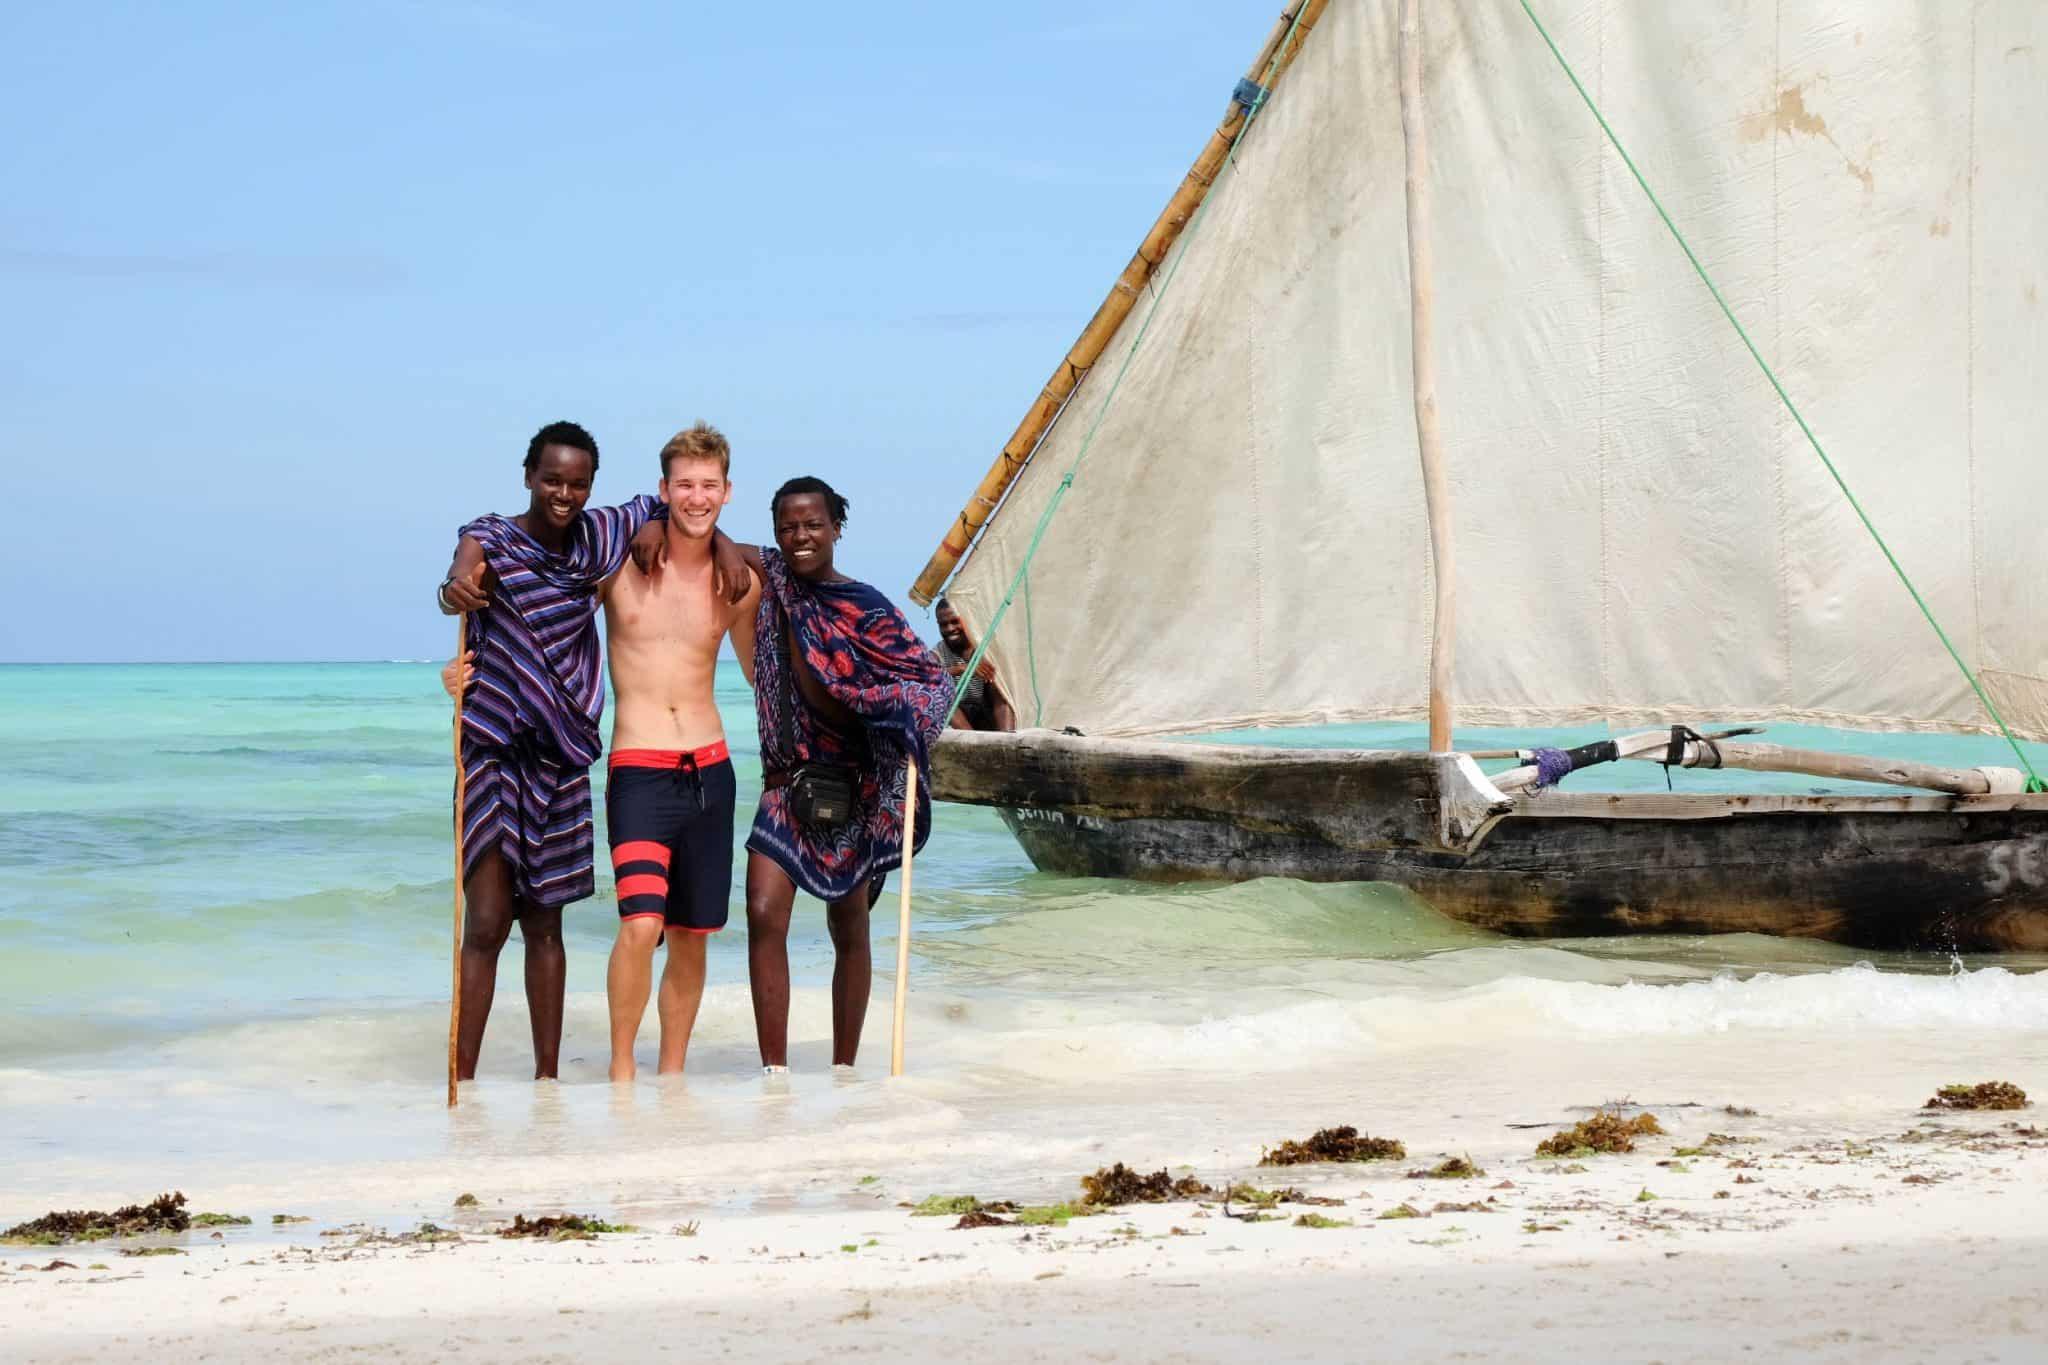 Cam and the Maasai